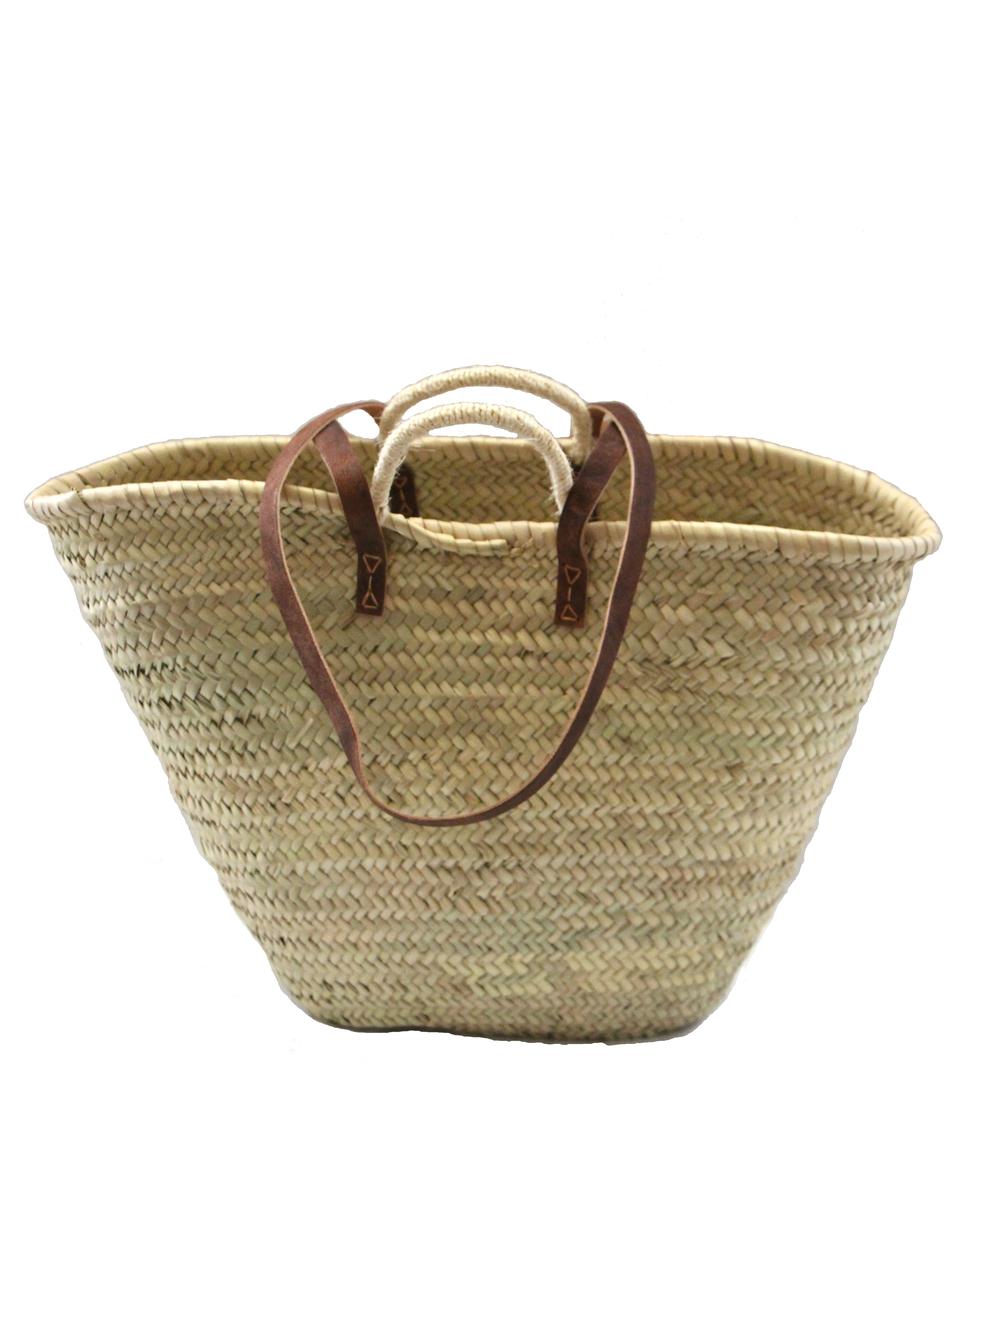 Sea grass bags